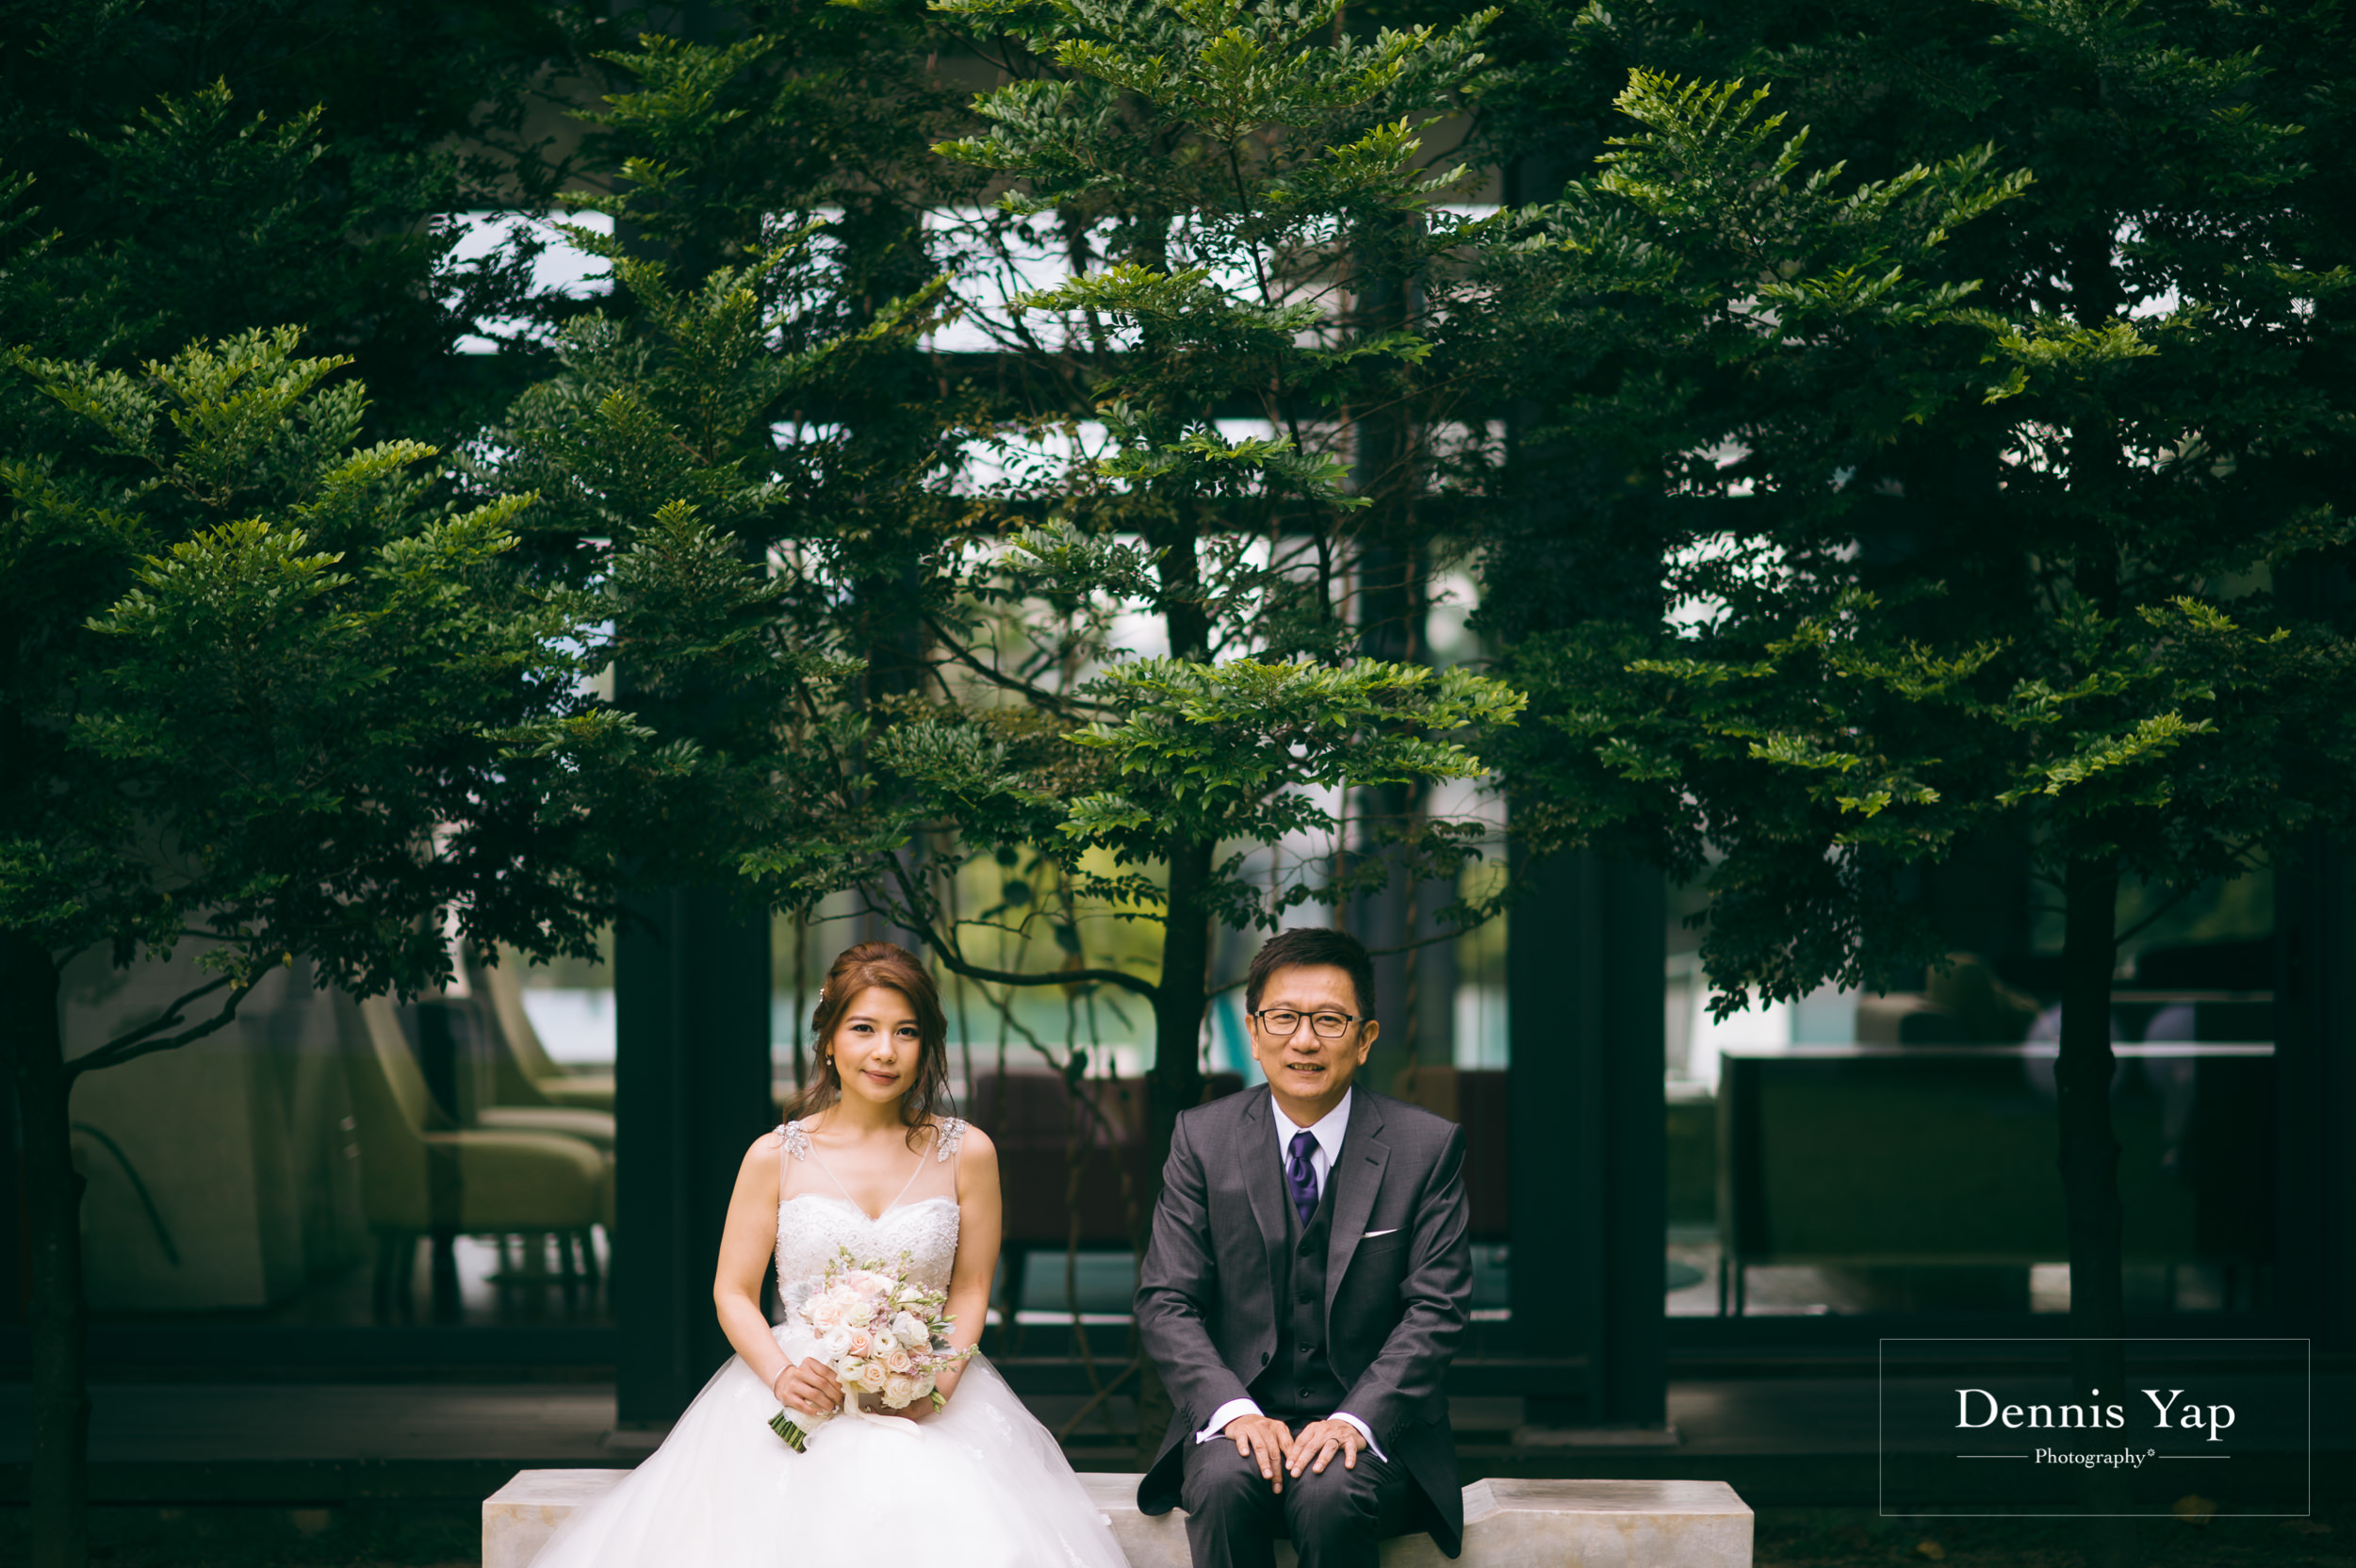 pung doris pre wedding desa park dennis yap photography-16.jpg